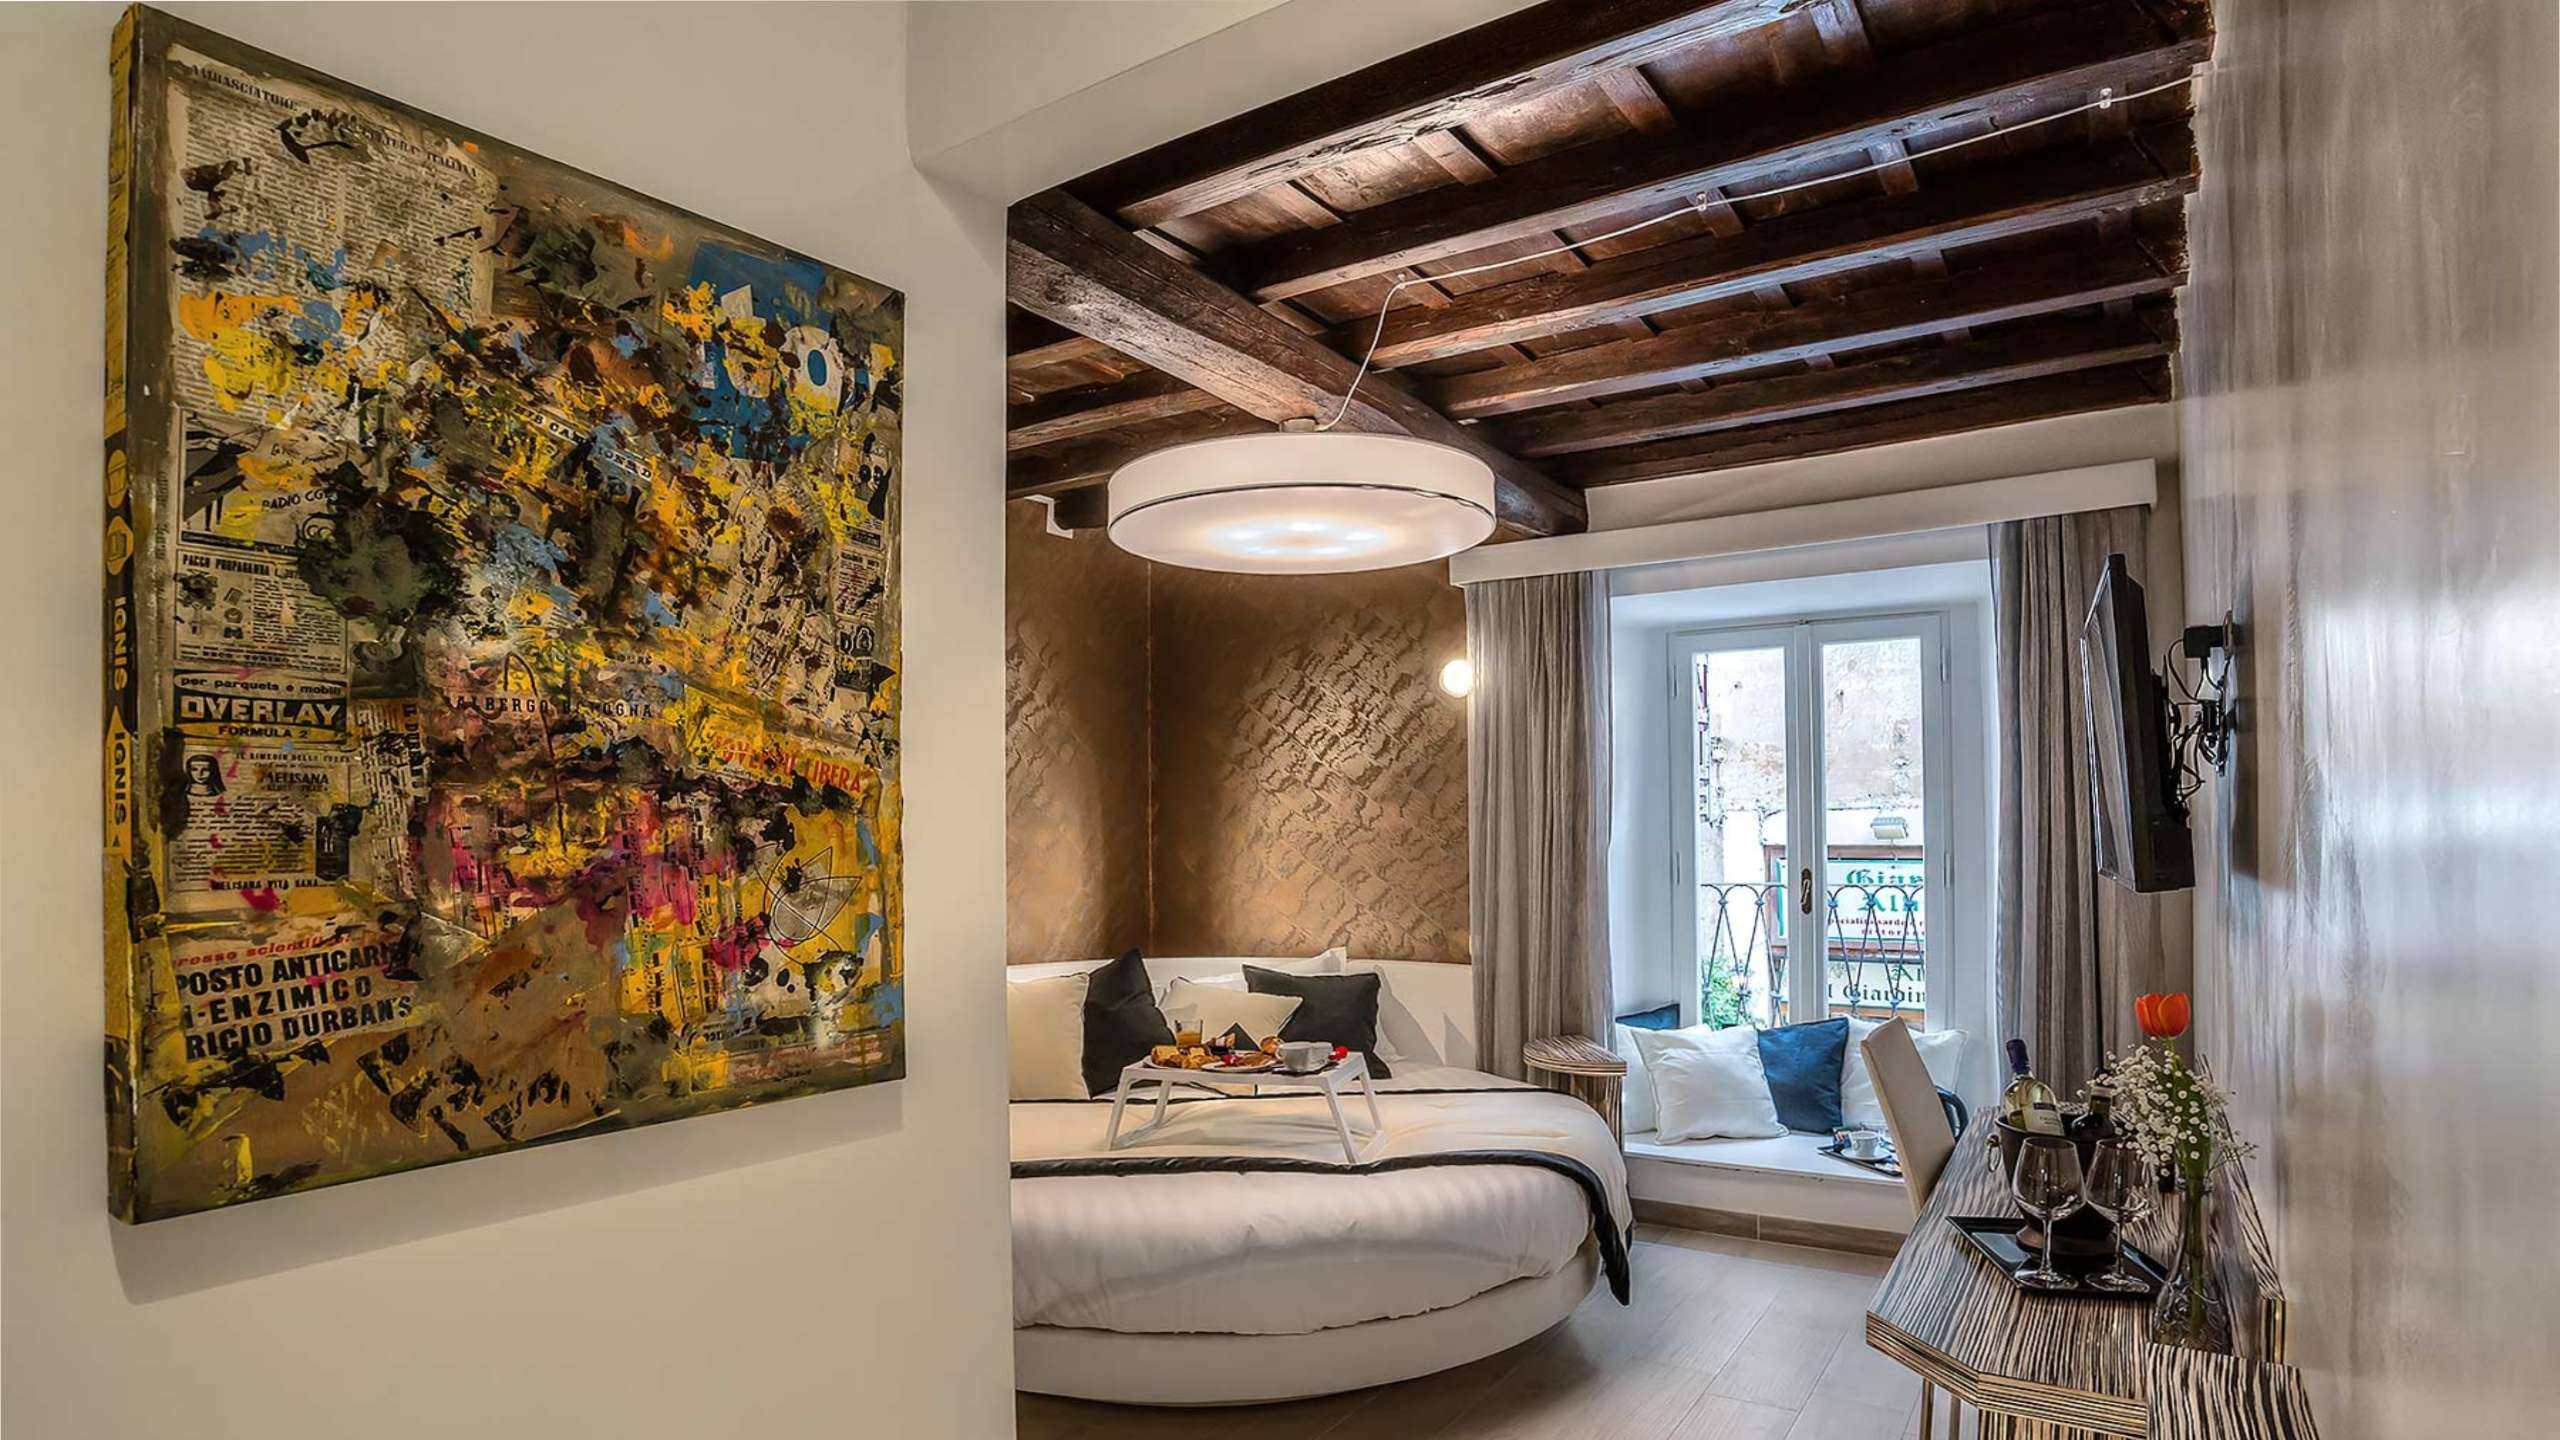 Colonna-suite-del-corso-guest-house-rome-deluxe-brown-room-3652